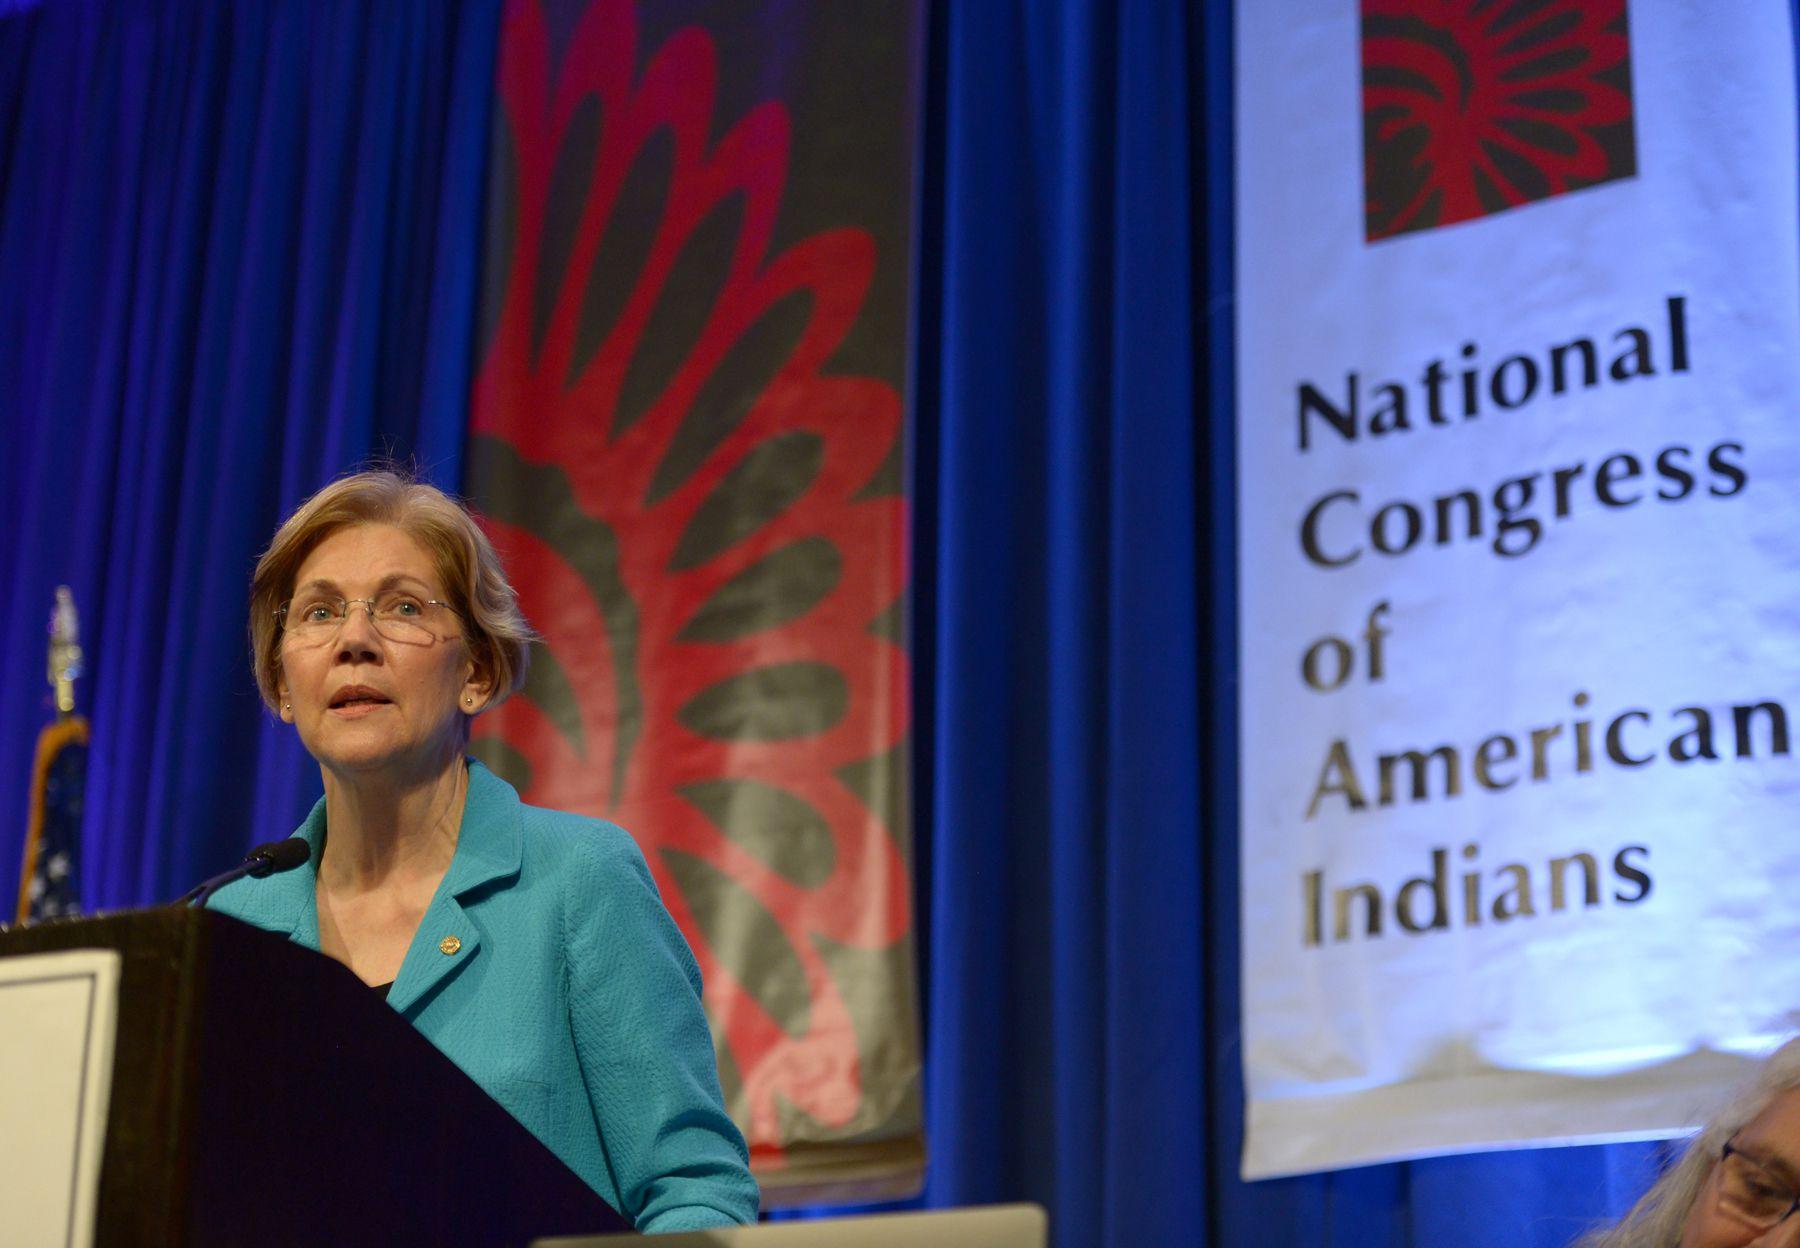 Elizabeth Warren releases results of DNA test - The Boston Globe